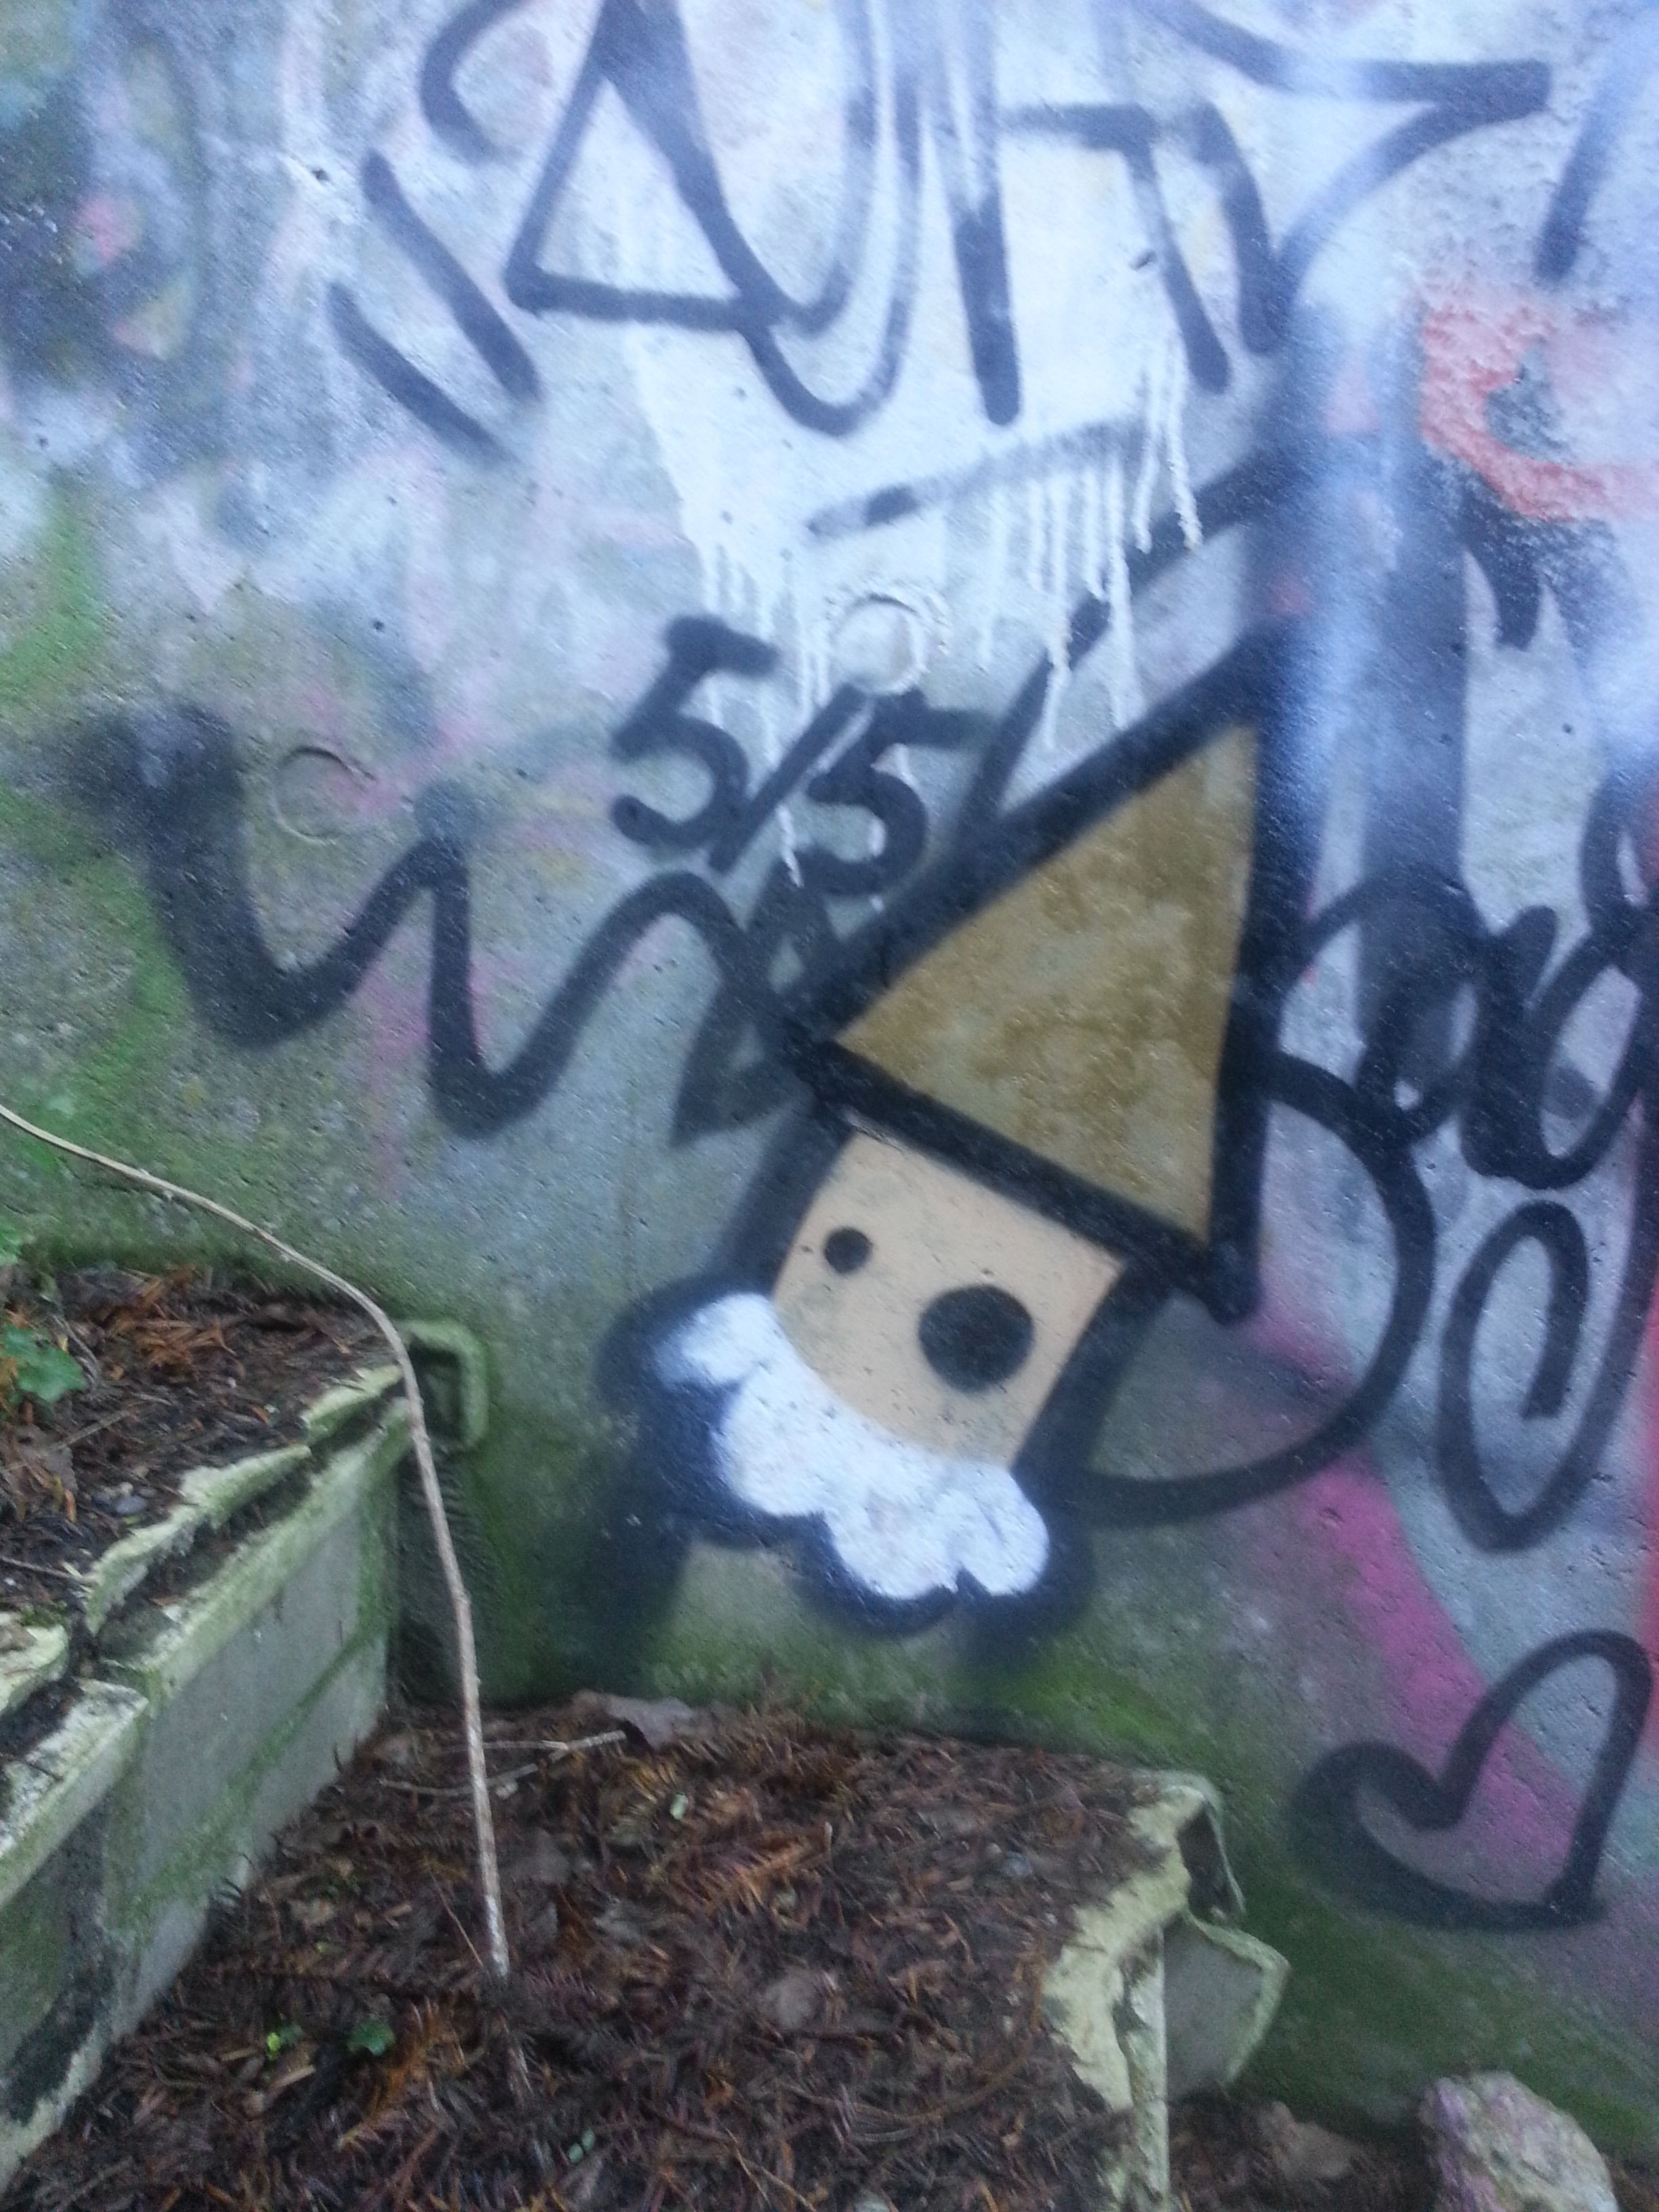 Artist(s): KBTR Location: Utrecht, Grindbak Photo made: 23/12/2015